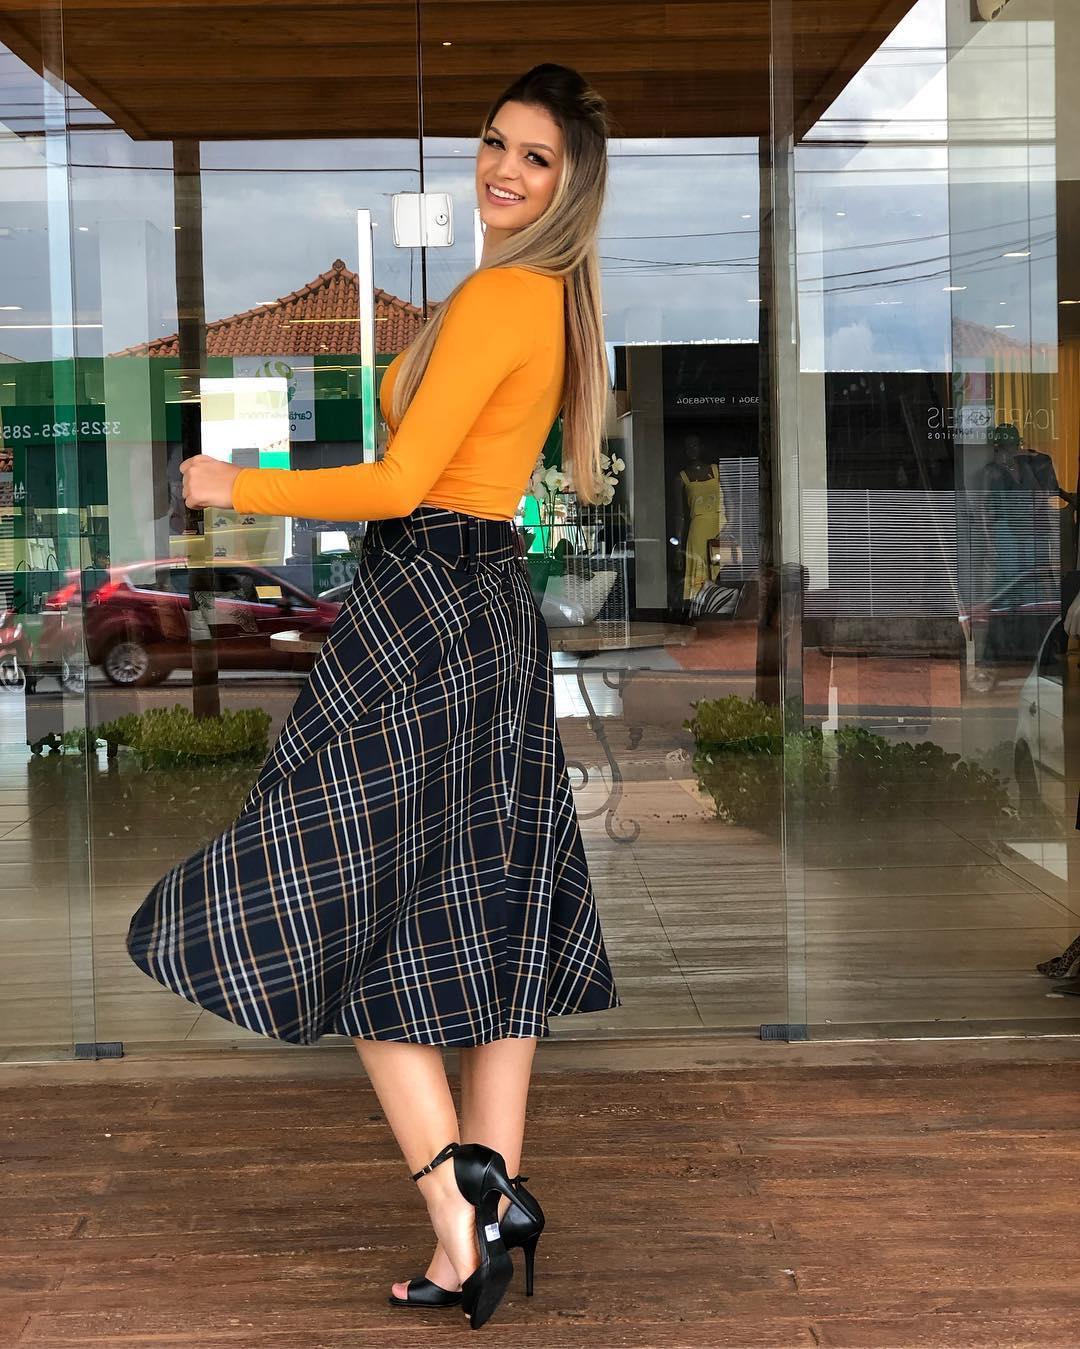 maria gabriela batistela, miss brasil terra 2019. - Página 6 51279110